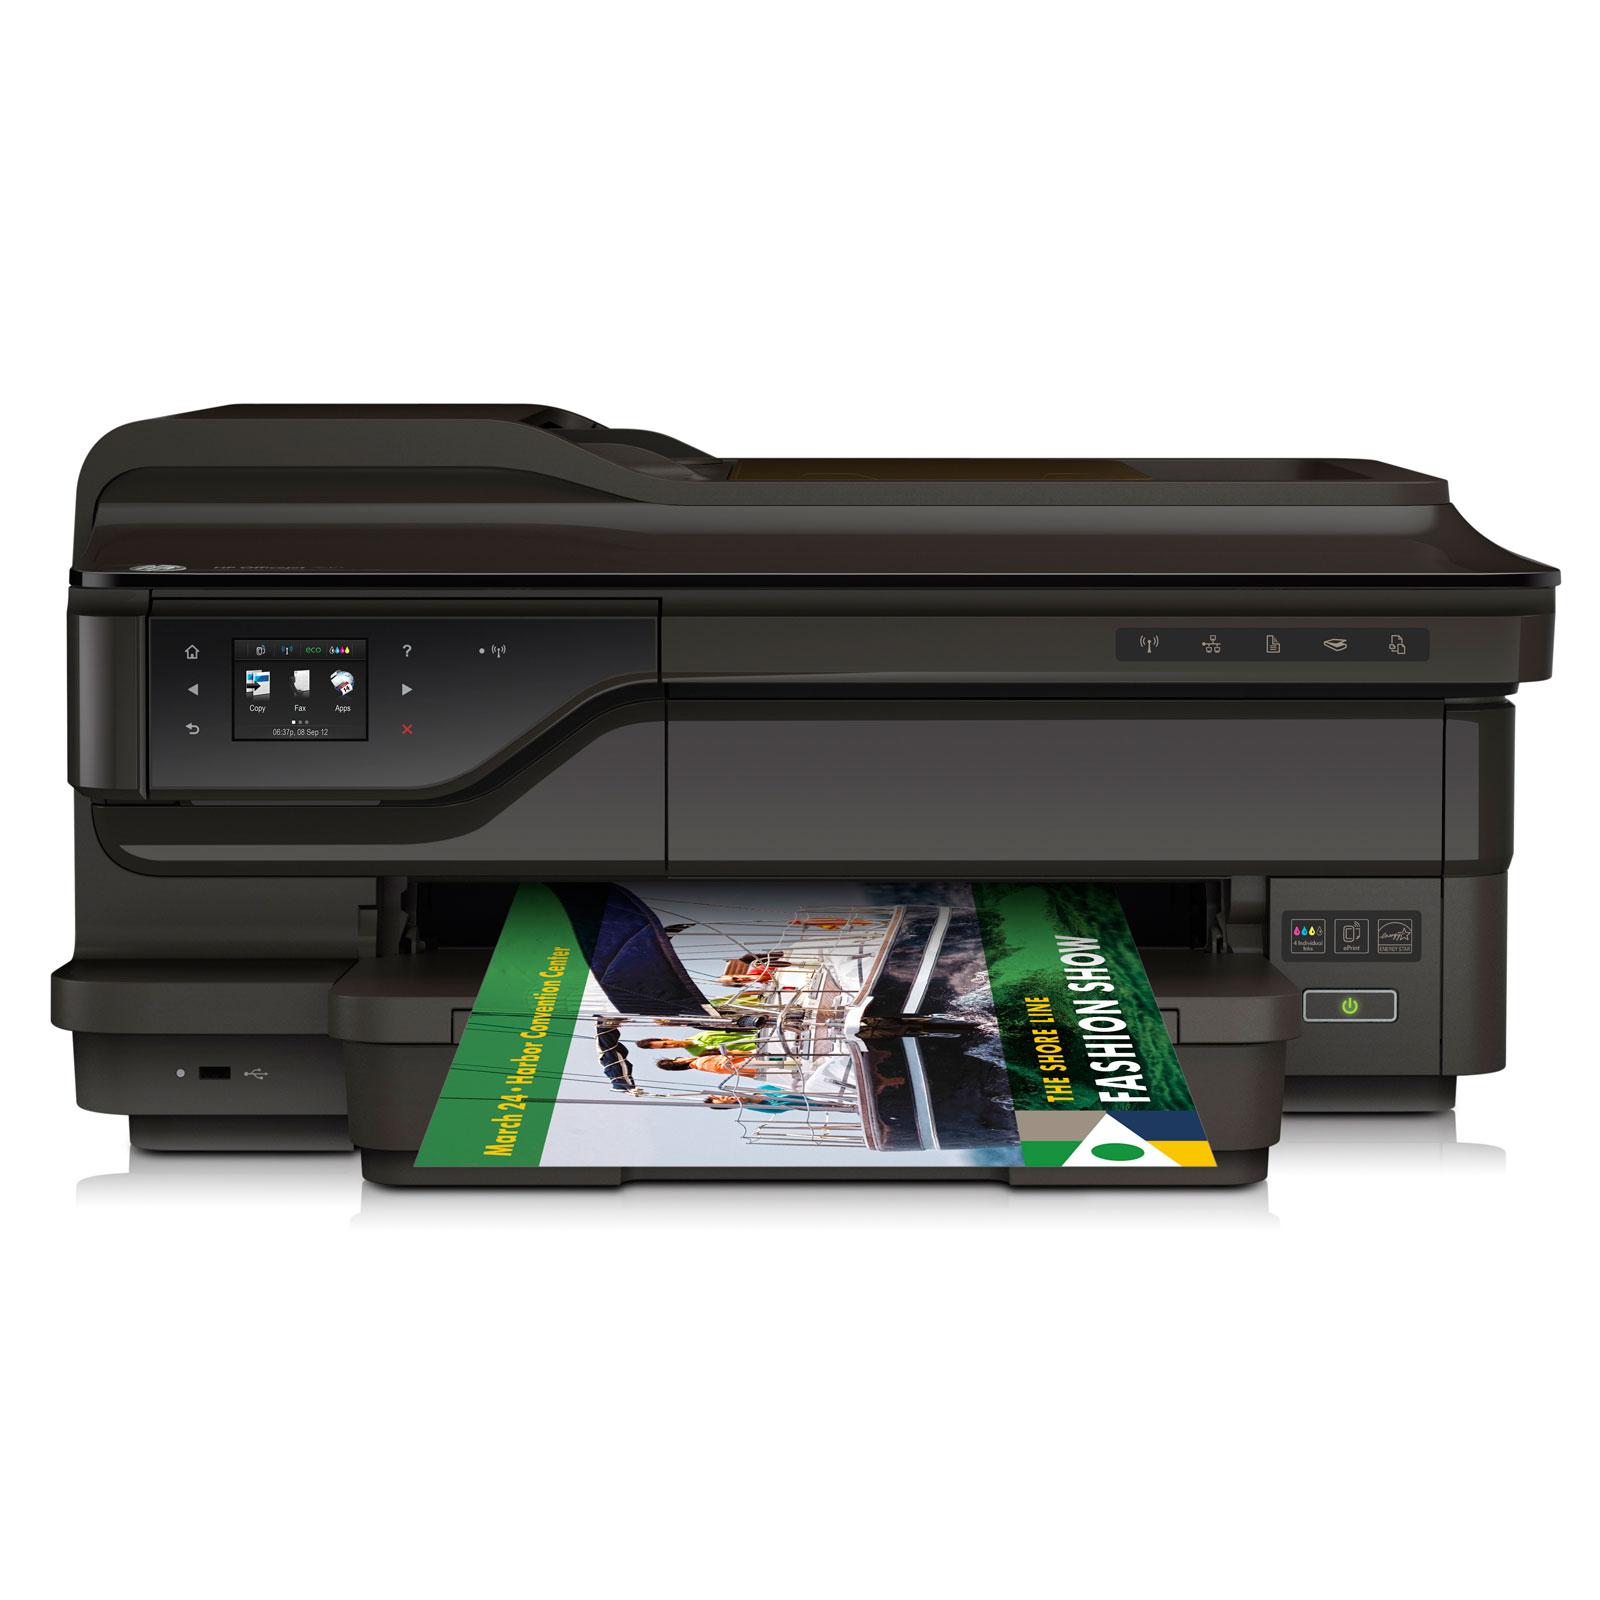 Imprimante multifonction HP Officejet 7612 WF Imprimante Multifonction jet d'encre couleur 4-en-1 (USB 2.0 / Ethernet / Wi-Fi)